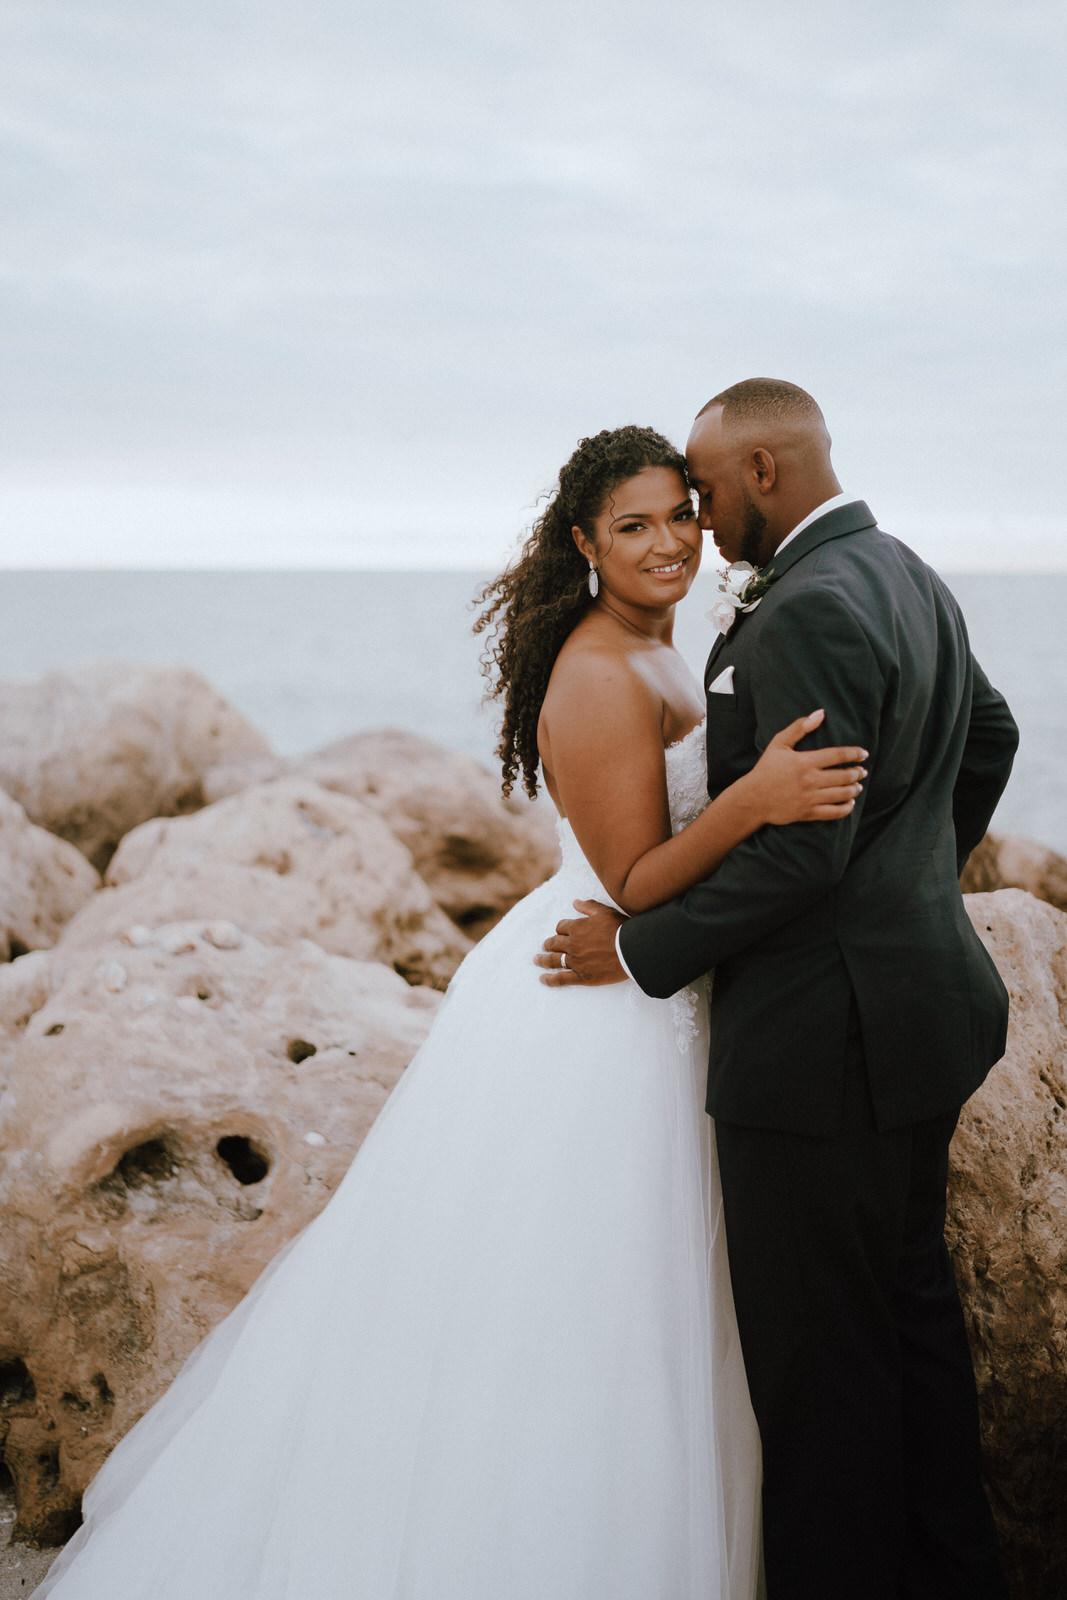 South Seas Island Resort Elopement- Alyana and Shawn- Michelle Gonzalez Photography-583.JPG